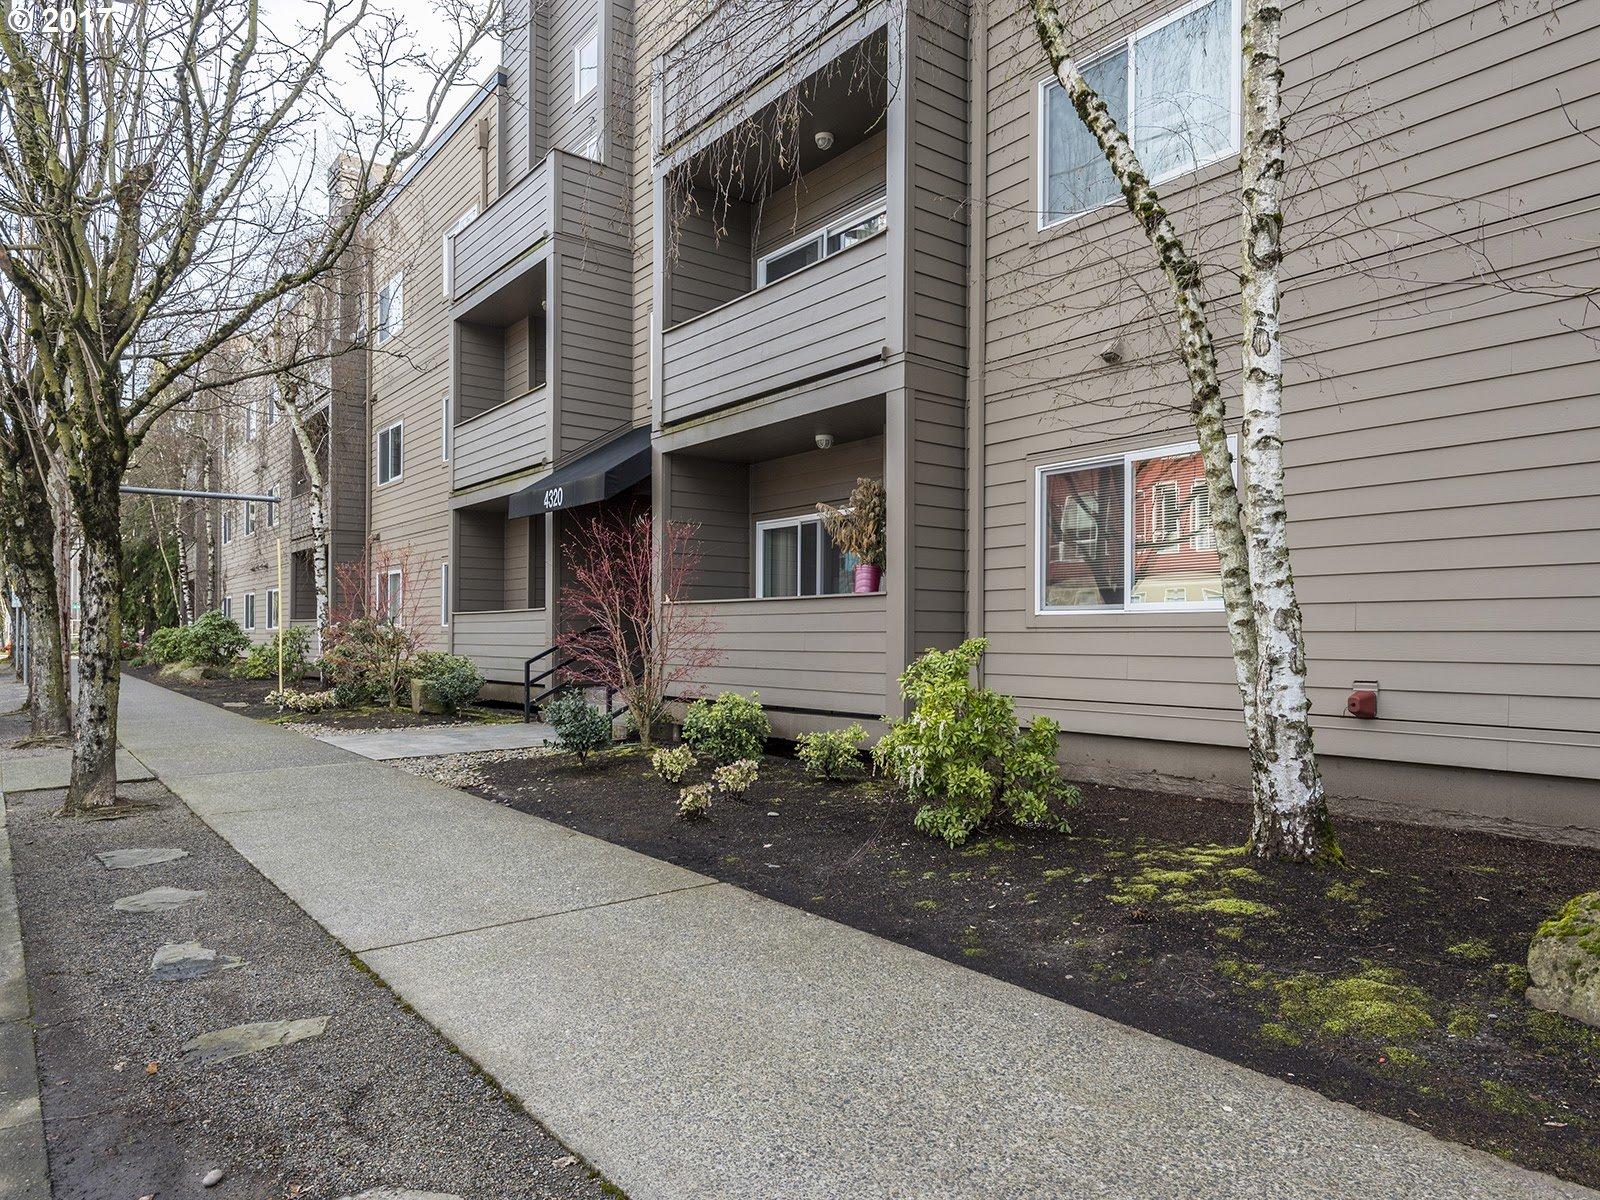 4320 SW CORBETT AVE, Portland, OR 97239